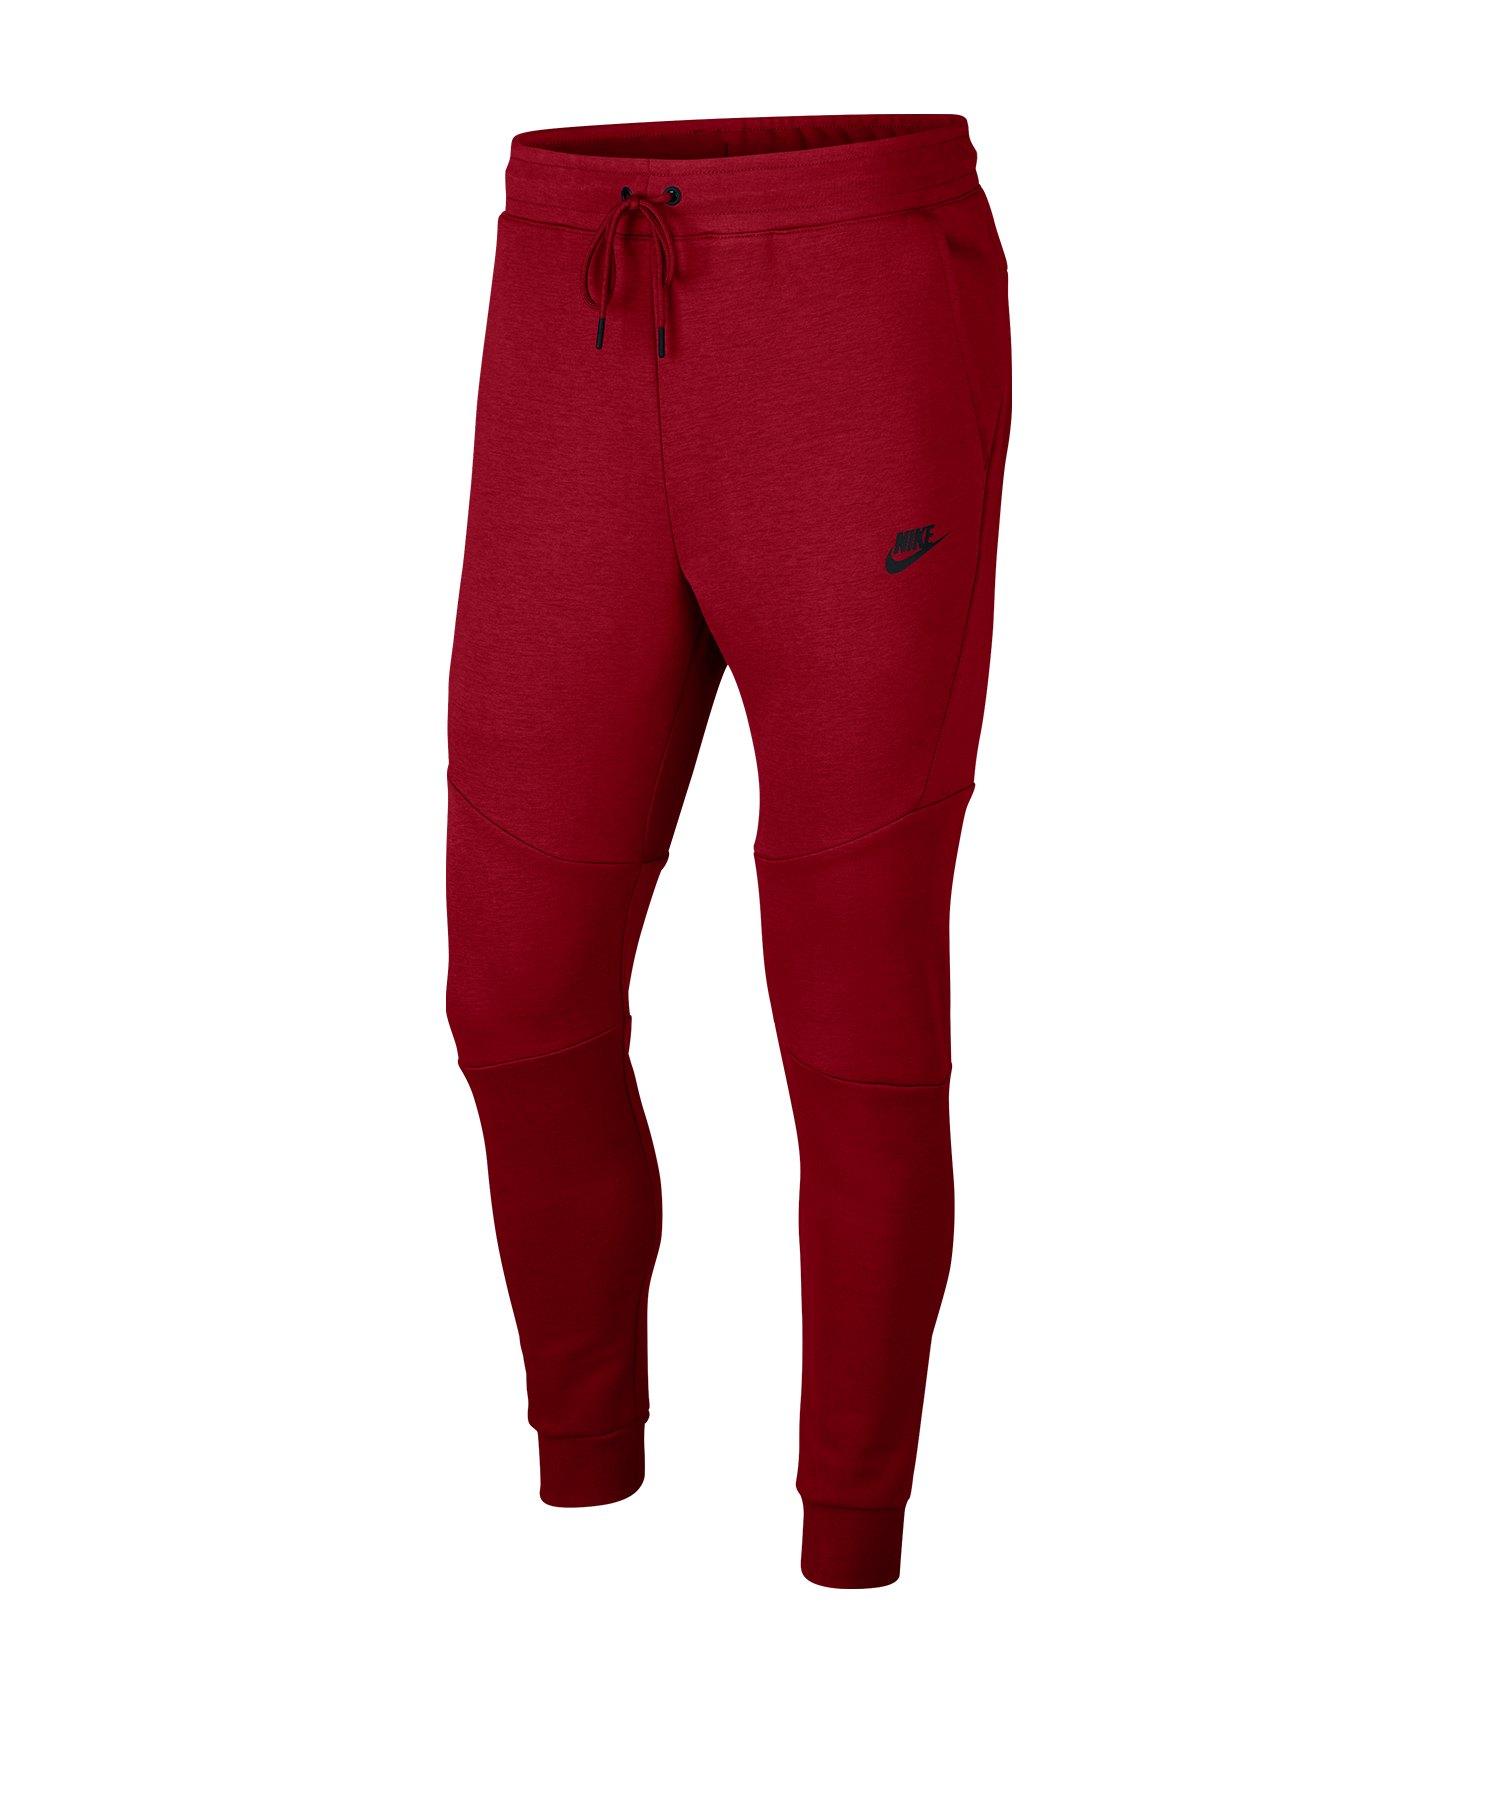 ziemlich cool Fang Junge Nike Tech Fleece Jogger Pant Hose Rot F678